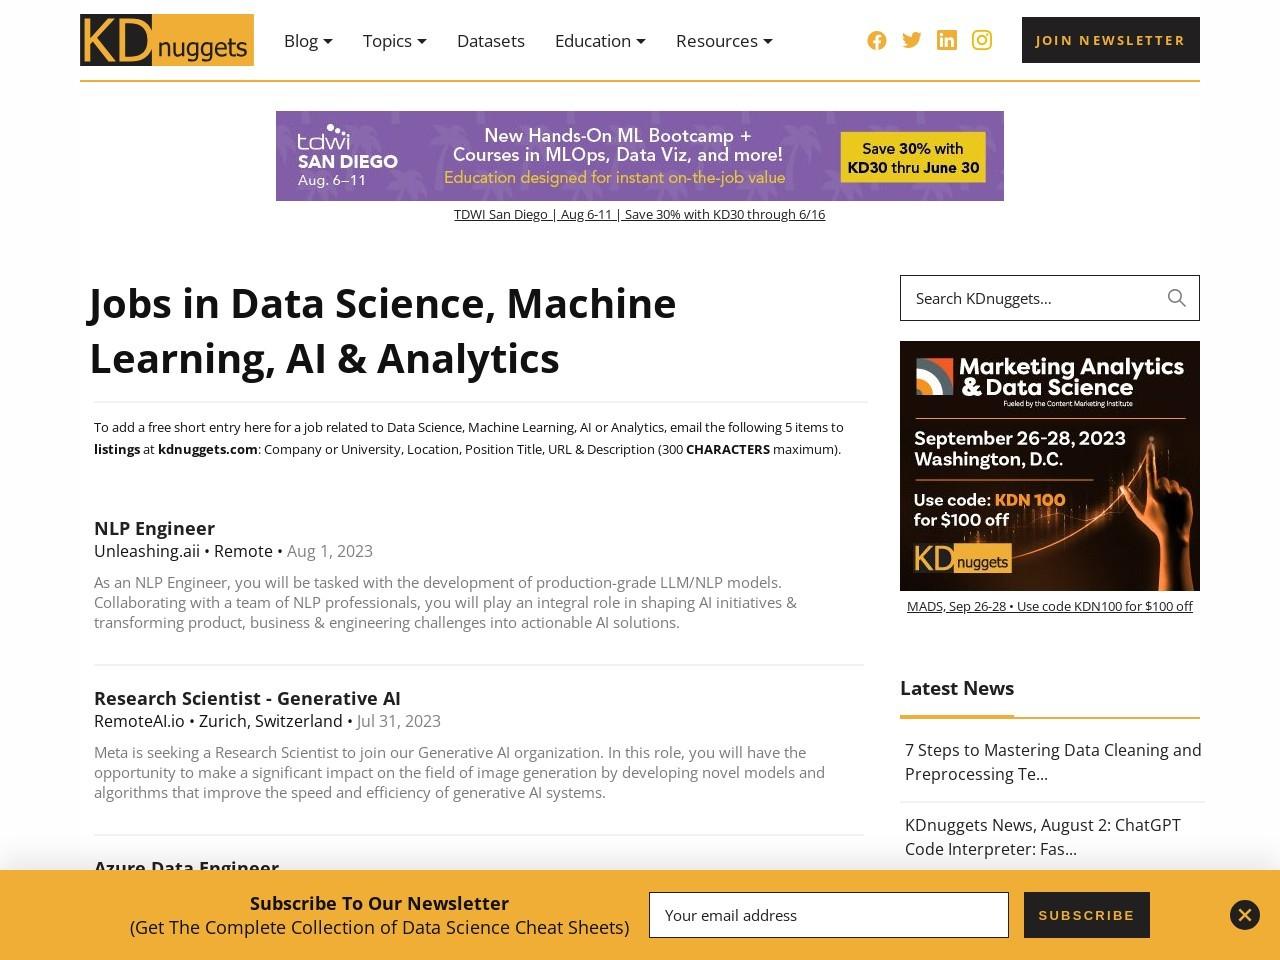 Michael J. Fox Foundation: CRM & Analytics Officer